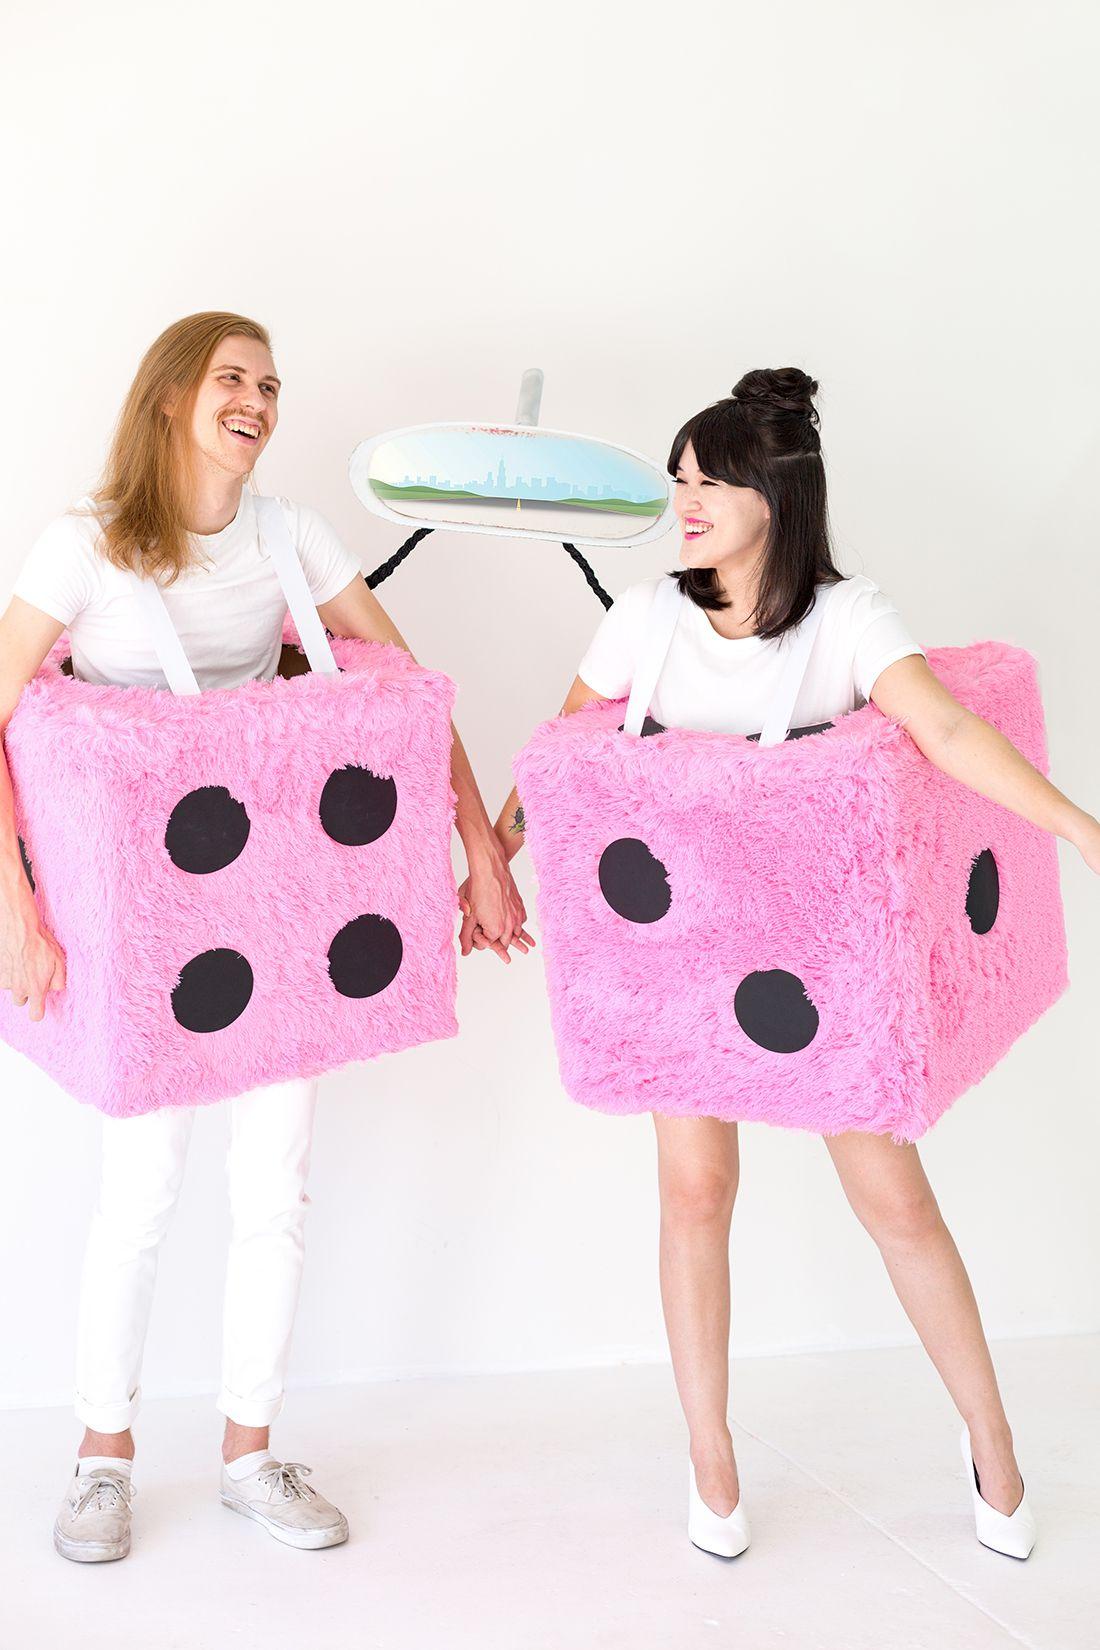 Creative Halloween Costumes For Friends.42 Best Friend Halloween Costumes 2021 Diy Bff Duo Costume Ideas